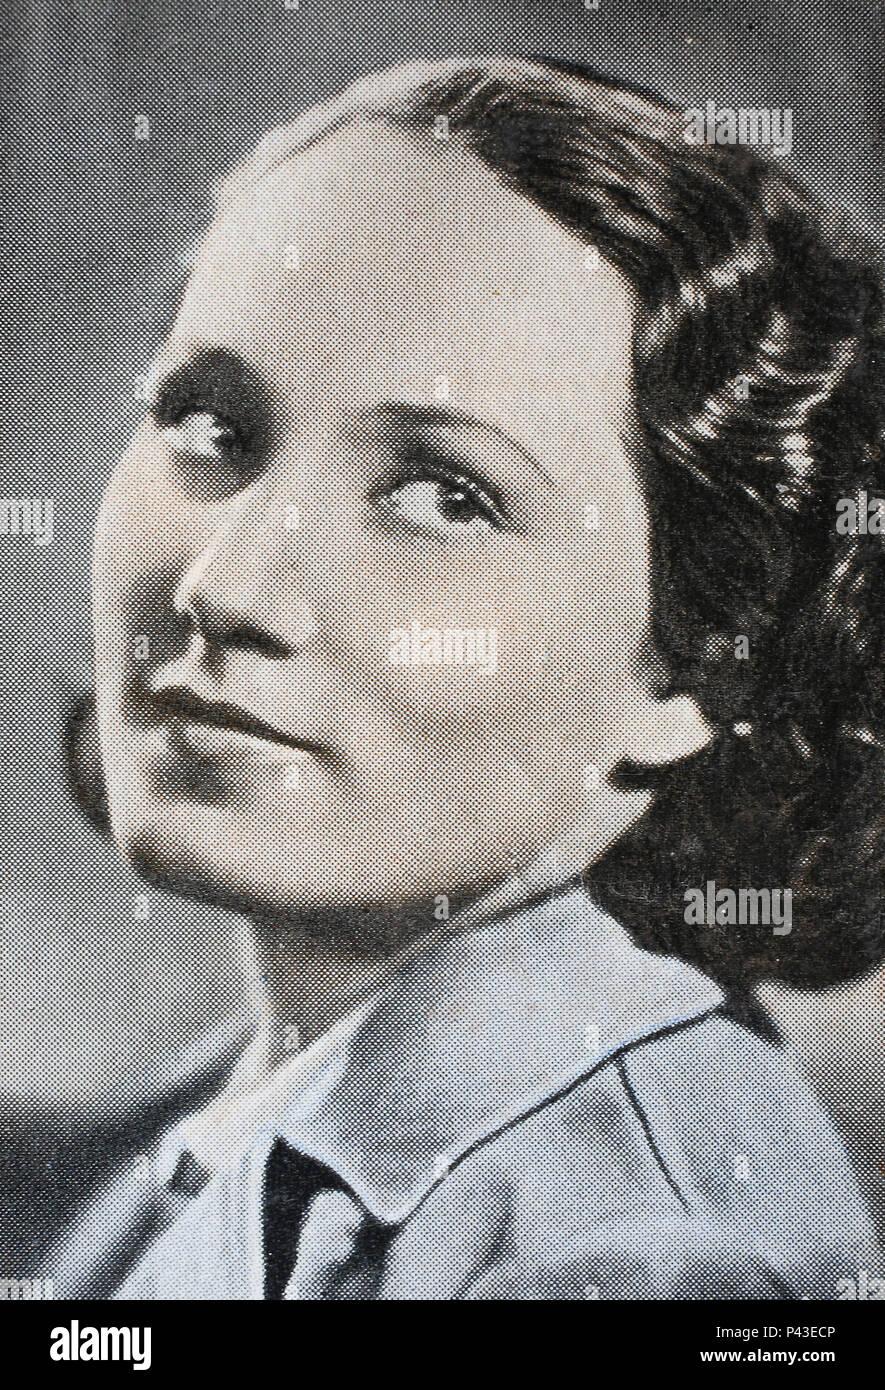 Horney women during world war ii retro